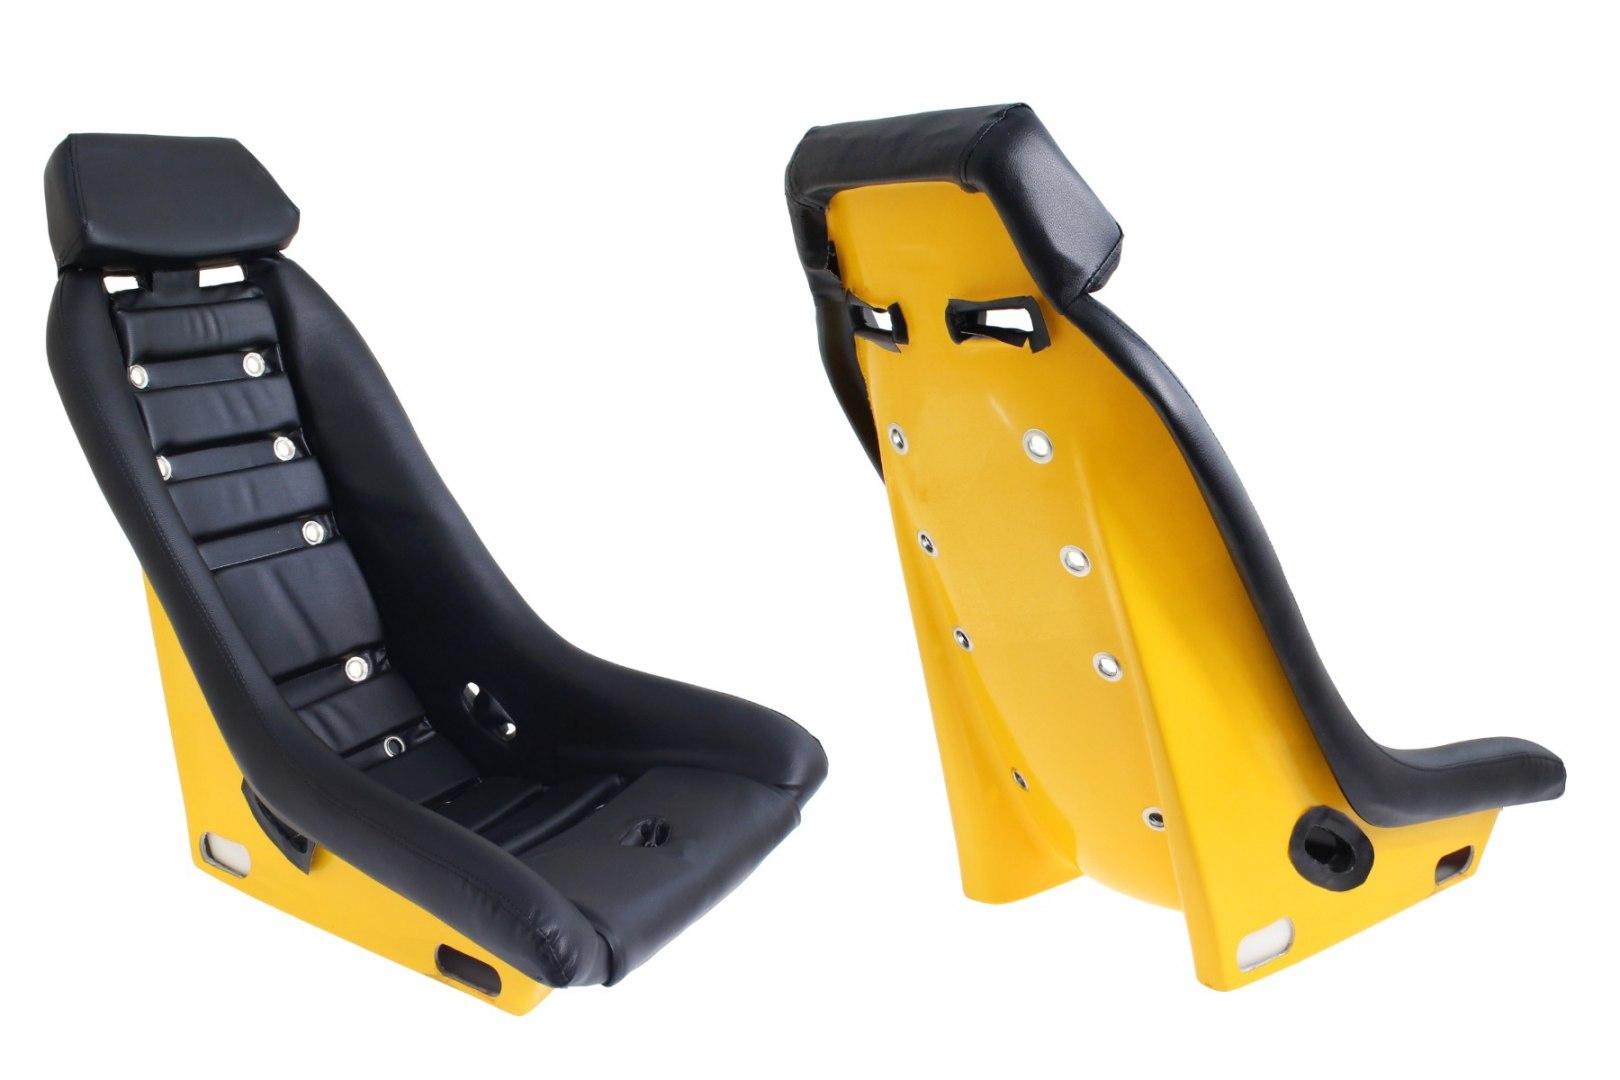 Fotel sportowy DJL RS023 Offroad Gokart - GRUBYGARAGE - Sklep Tuningowy